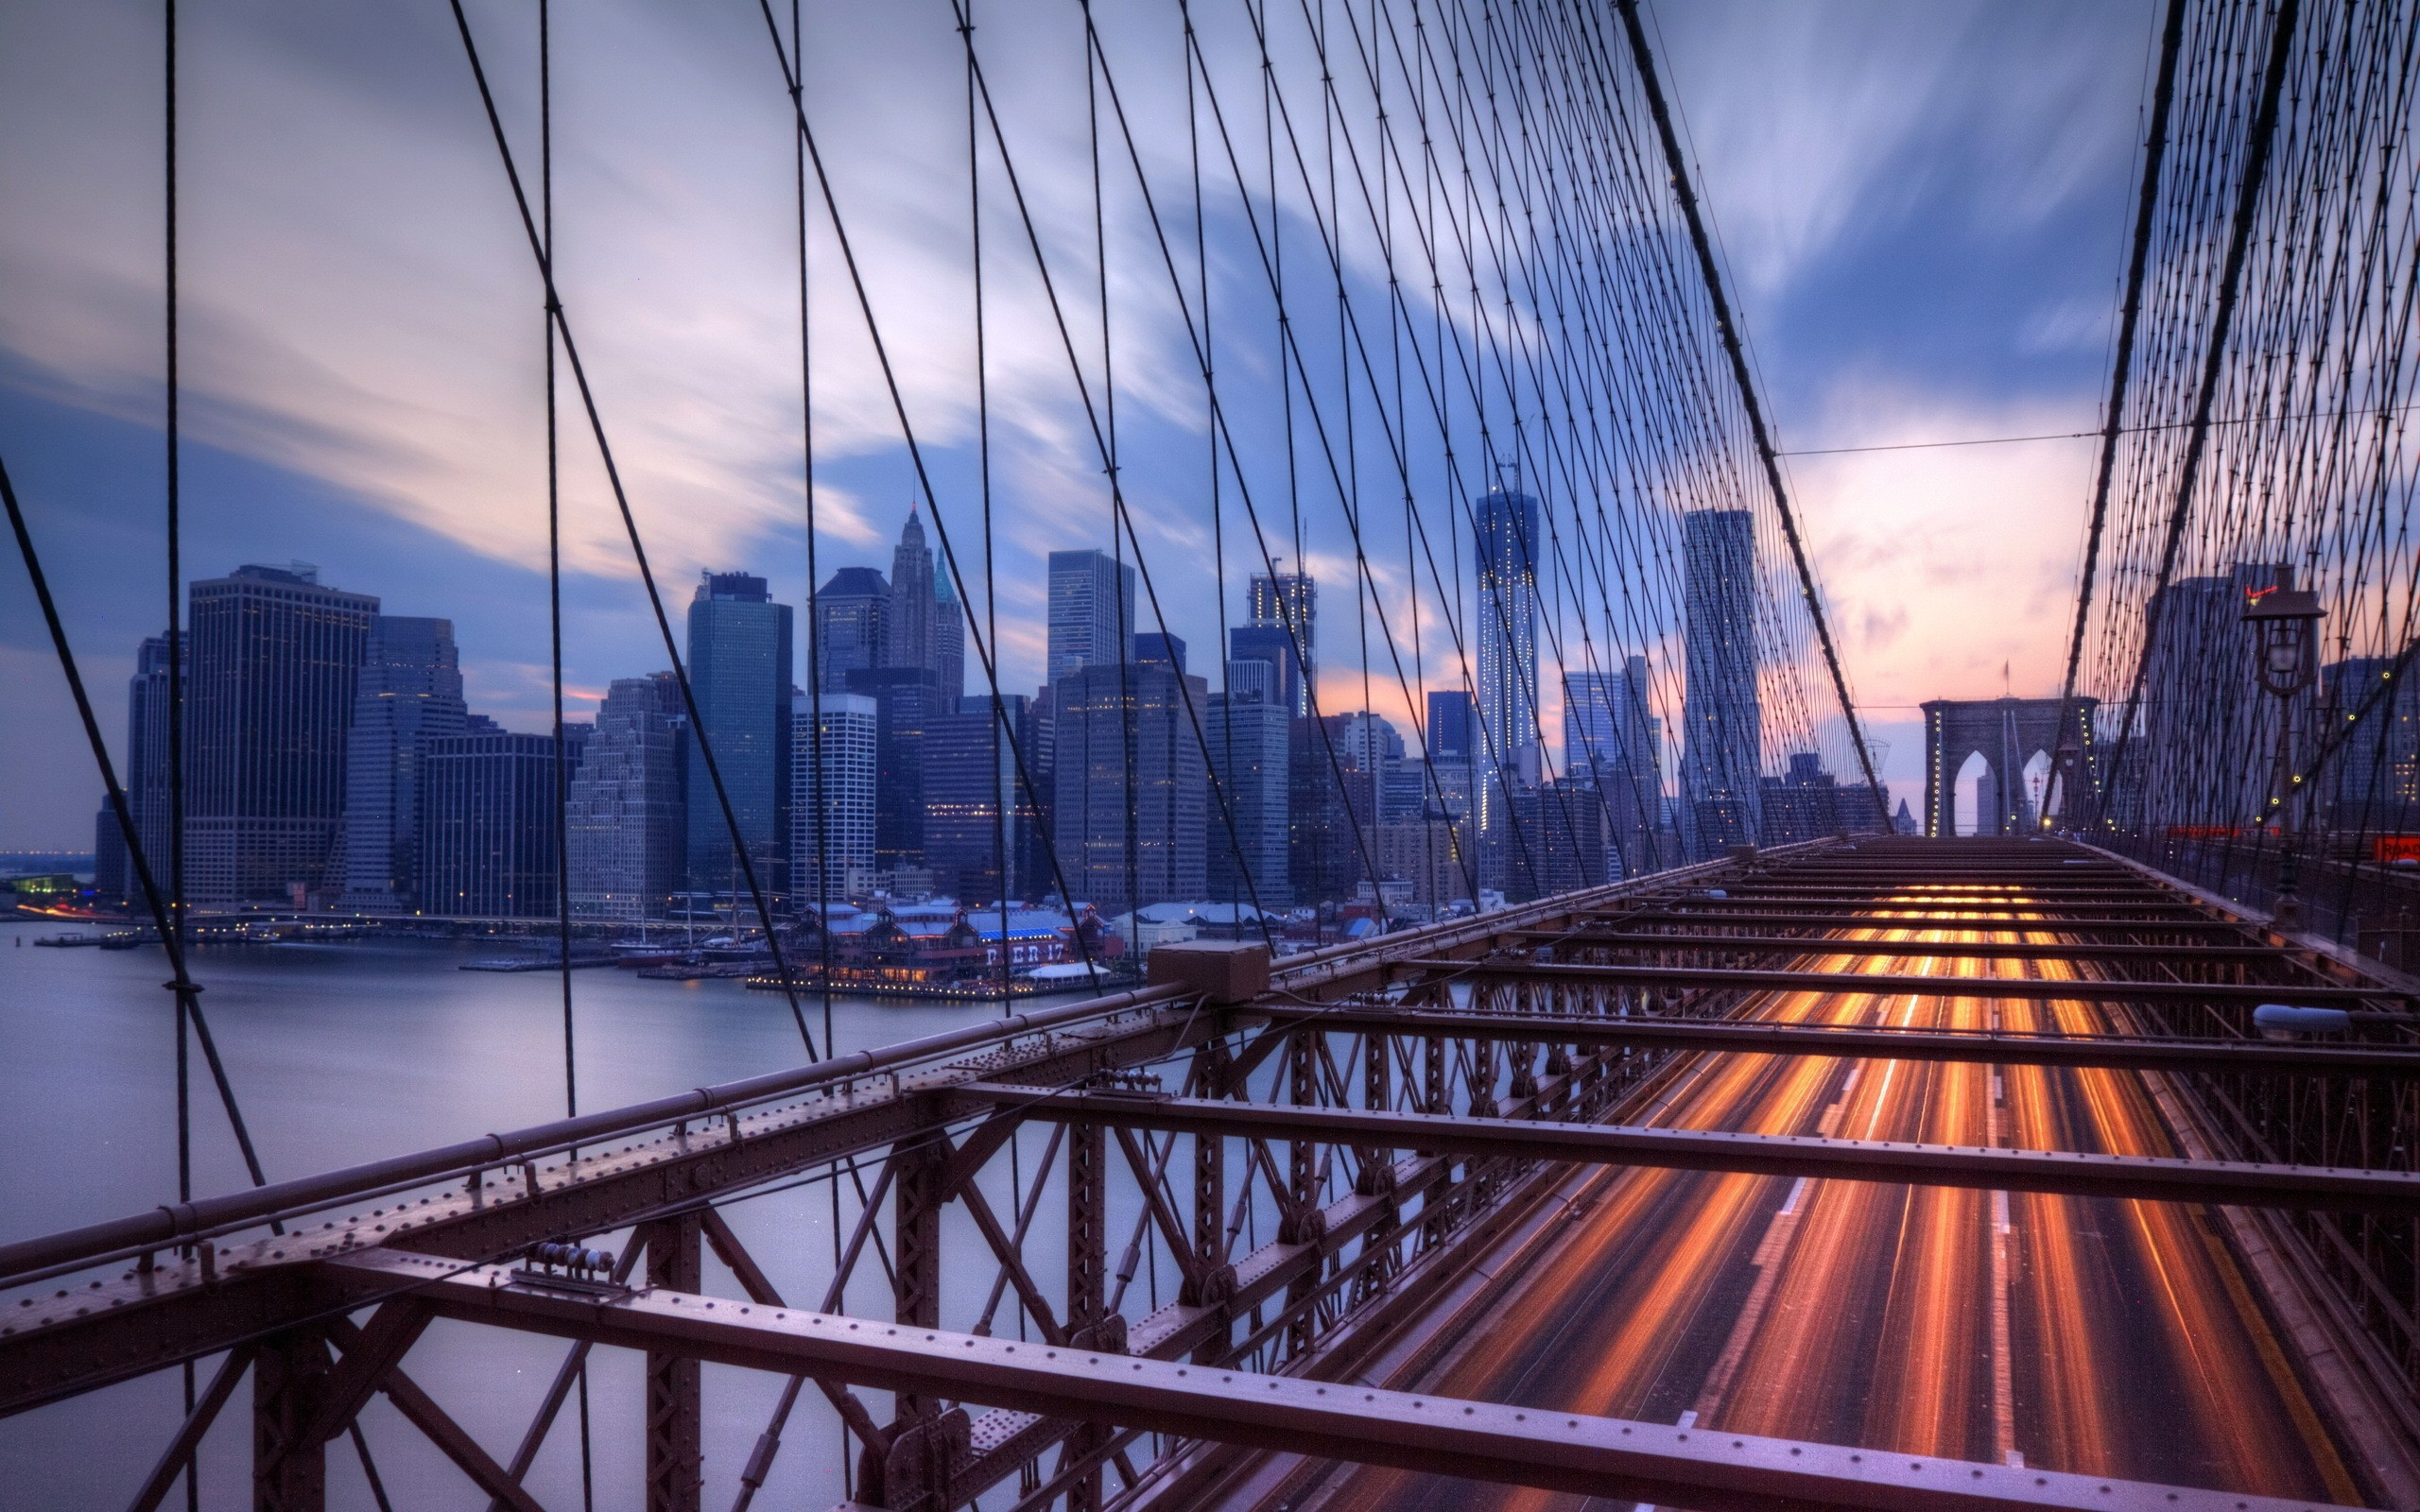 2560x1600 Cityscape City Building Bridge New York Brooklyn Wallpapers